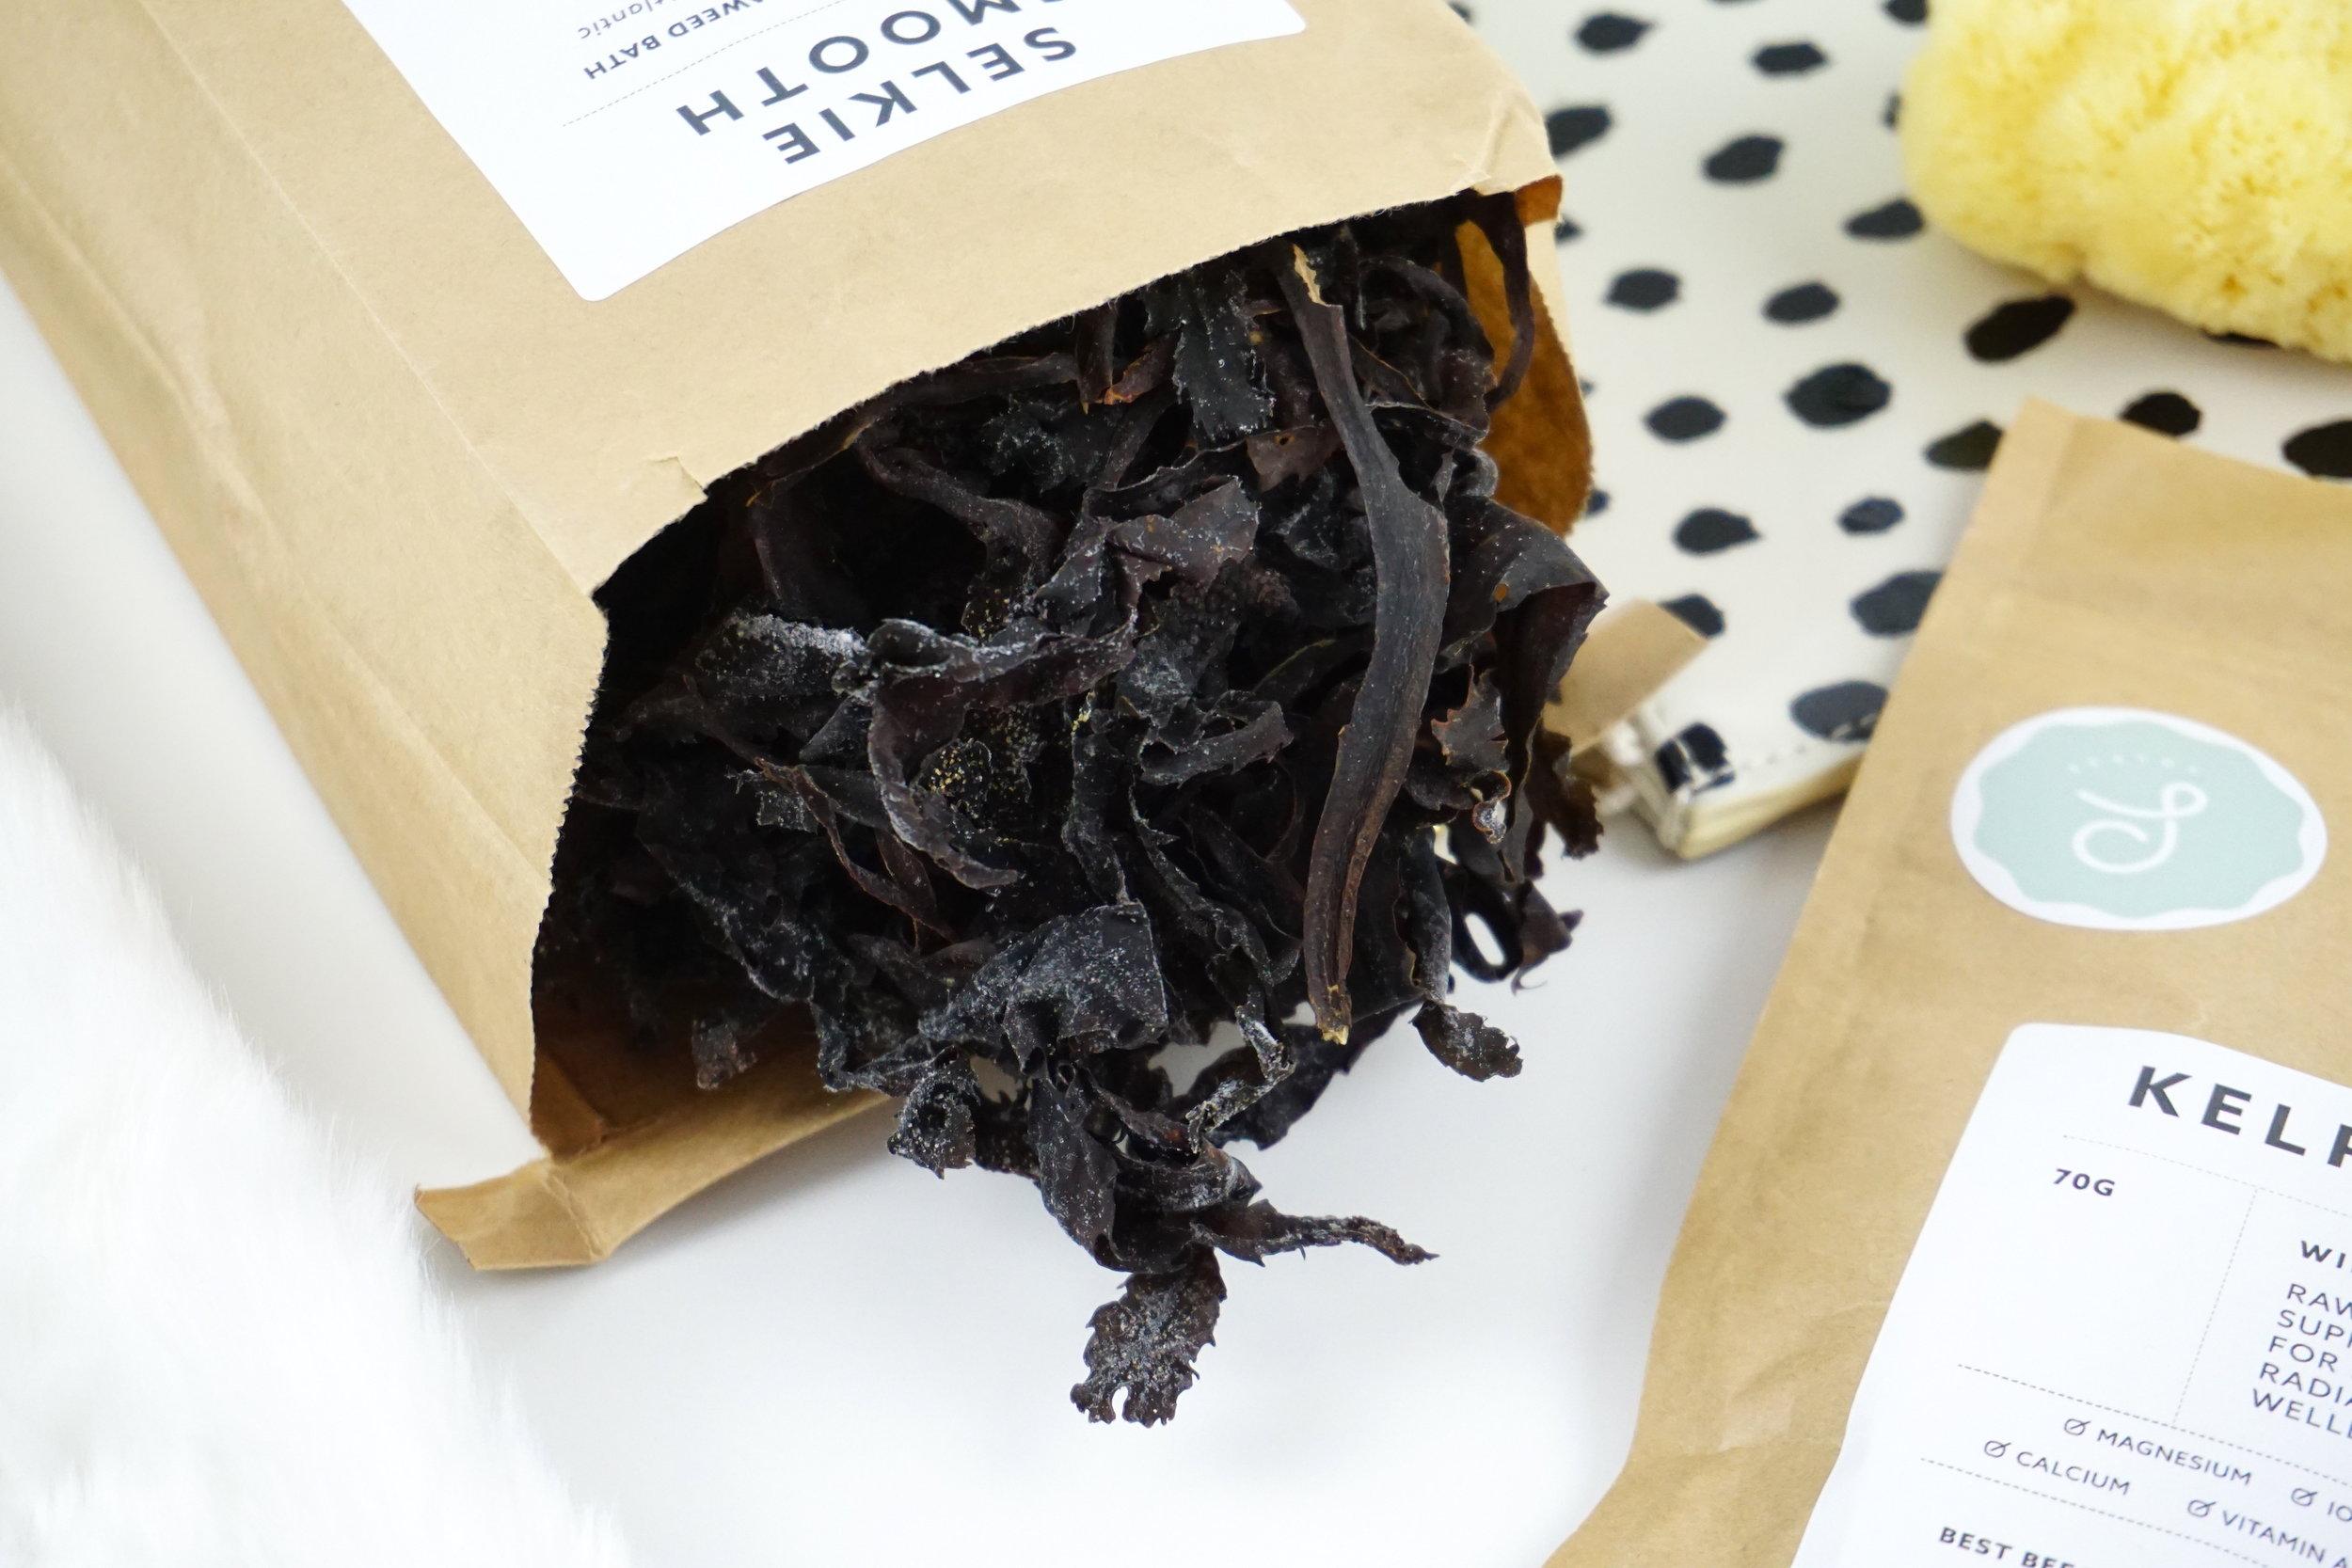 Seatox 'Selkie Smooth' Seaweed Bath -